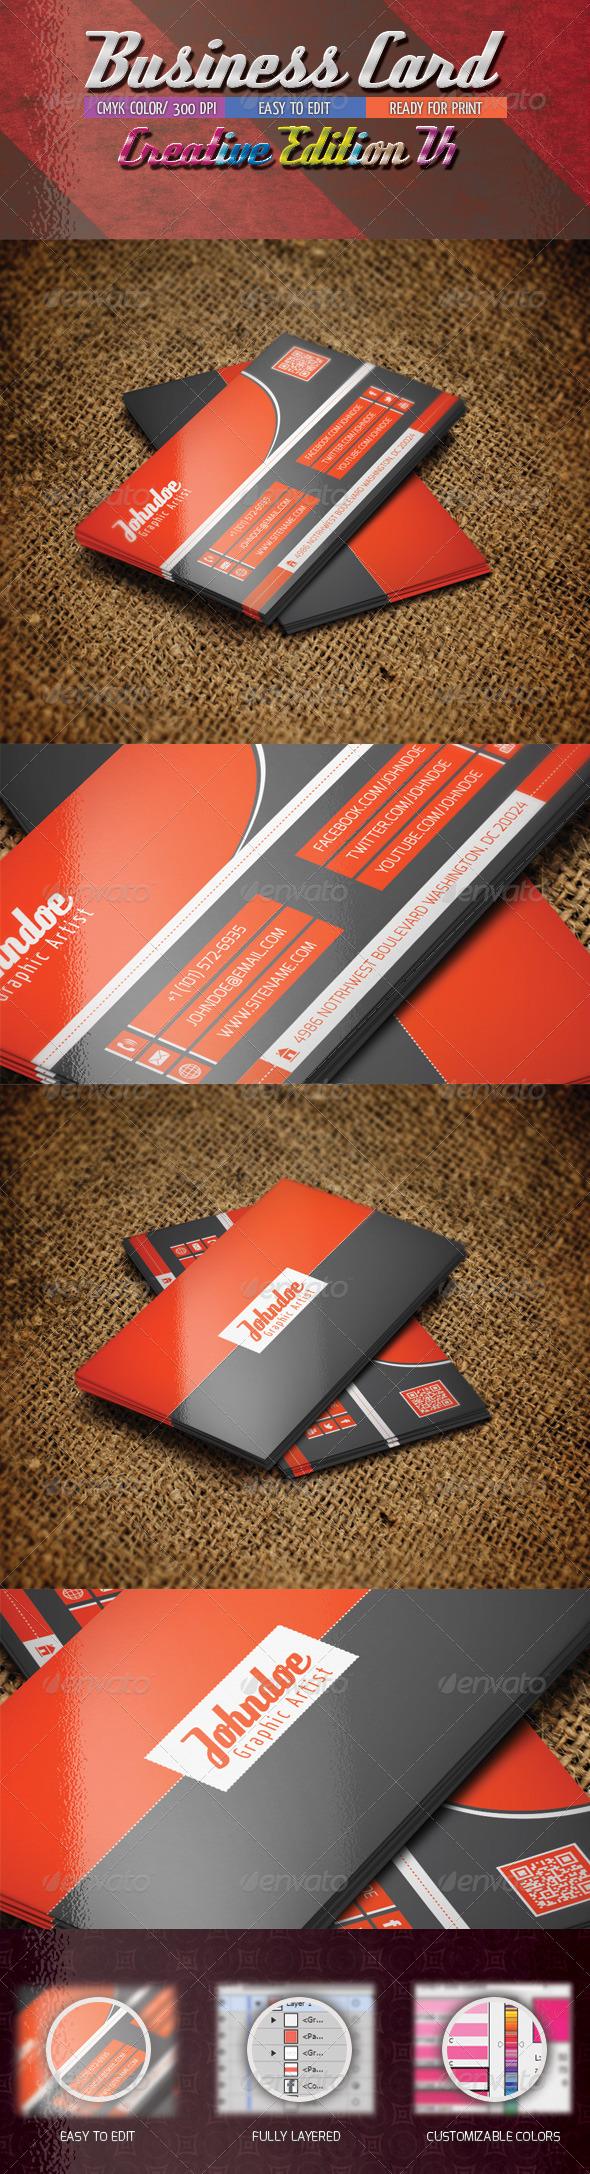 GraphicRiver Business Card Creative Edition V1 4802794